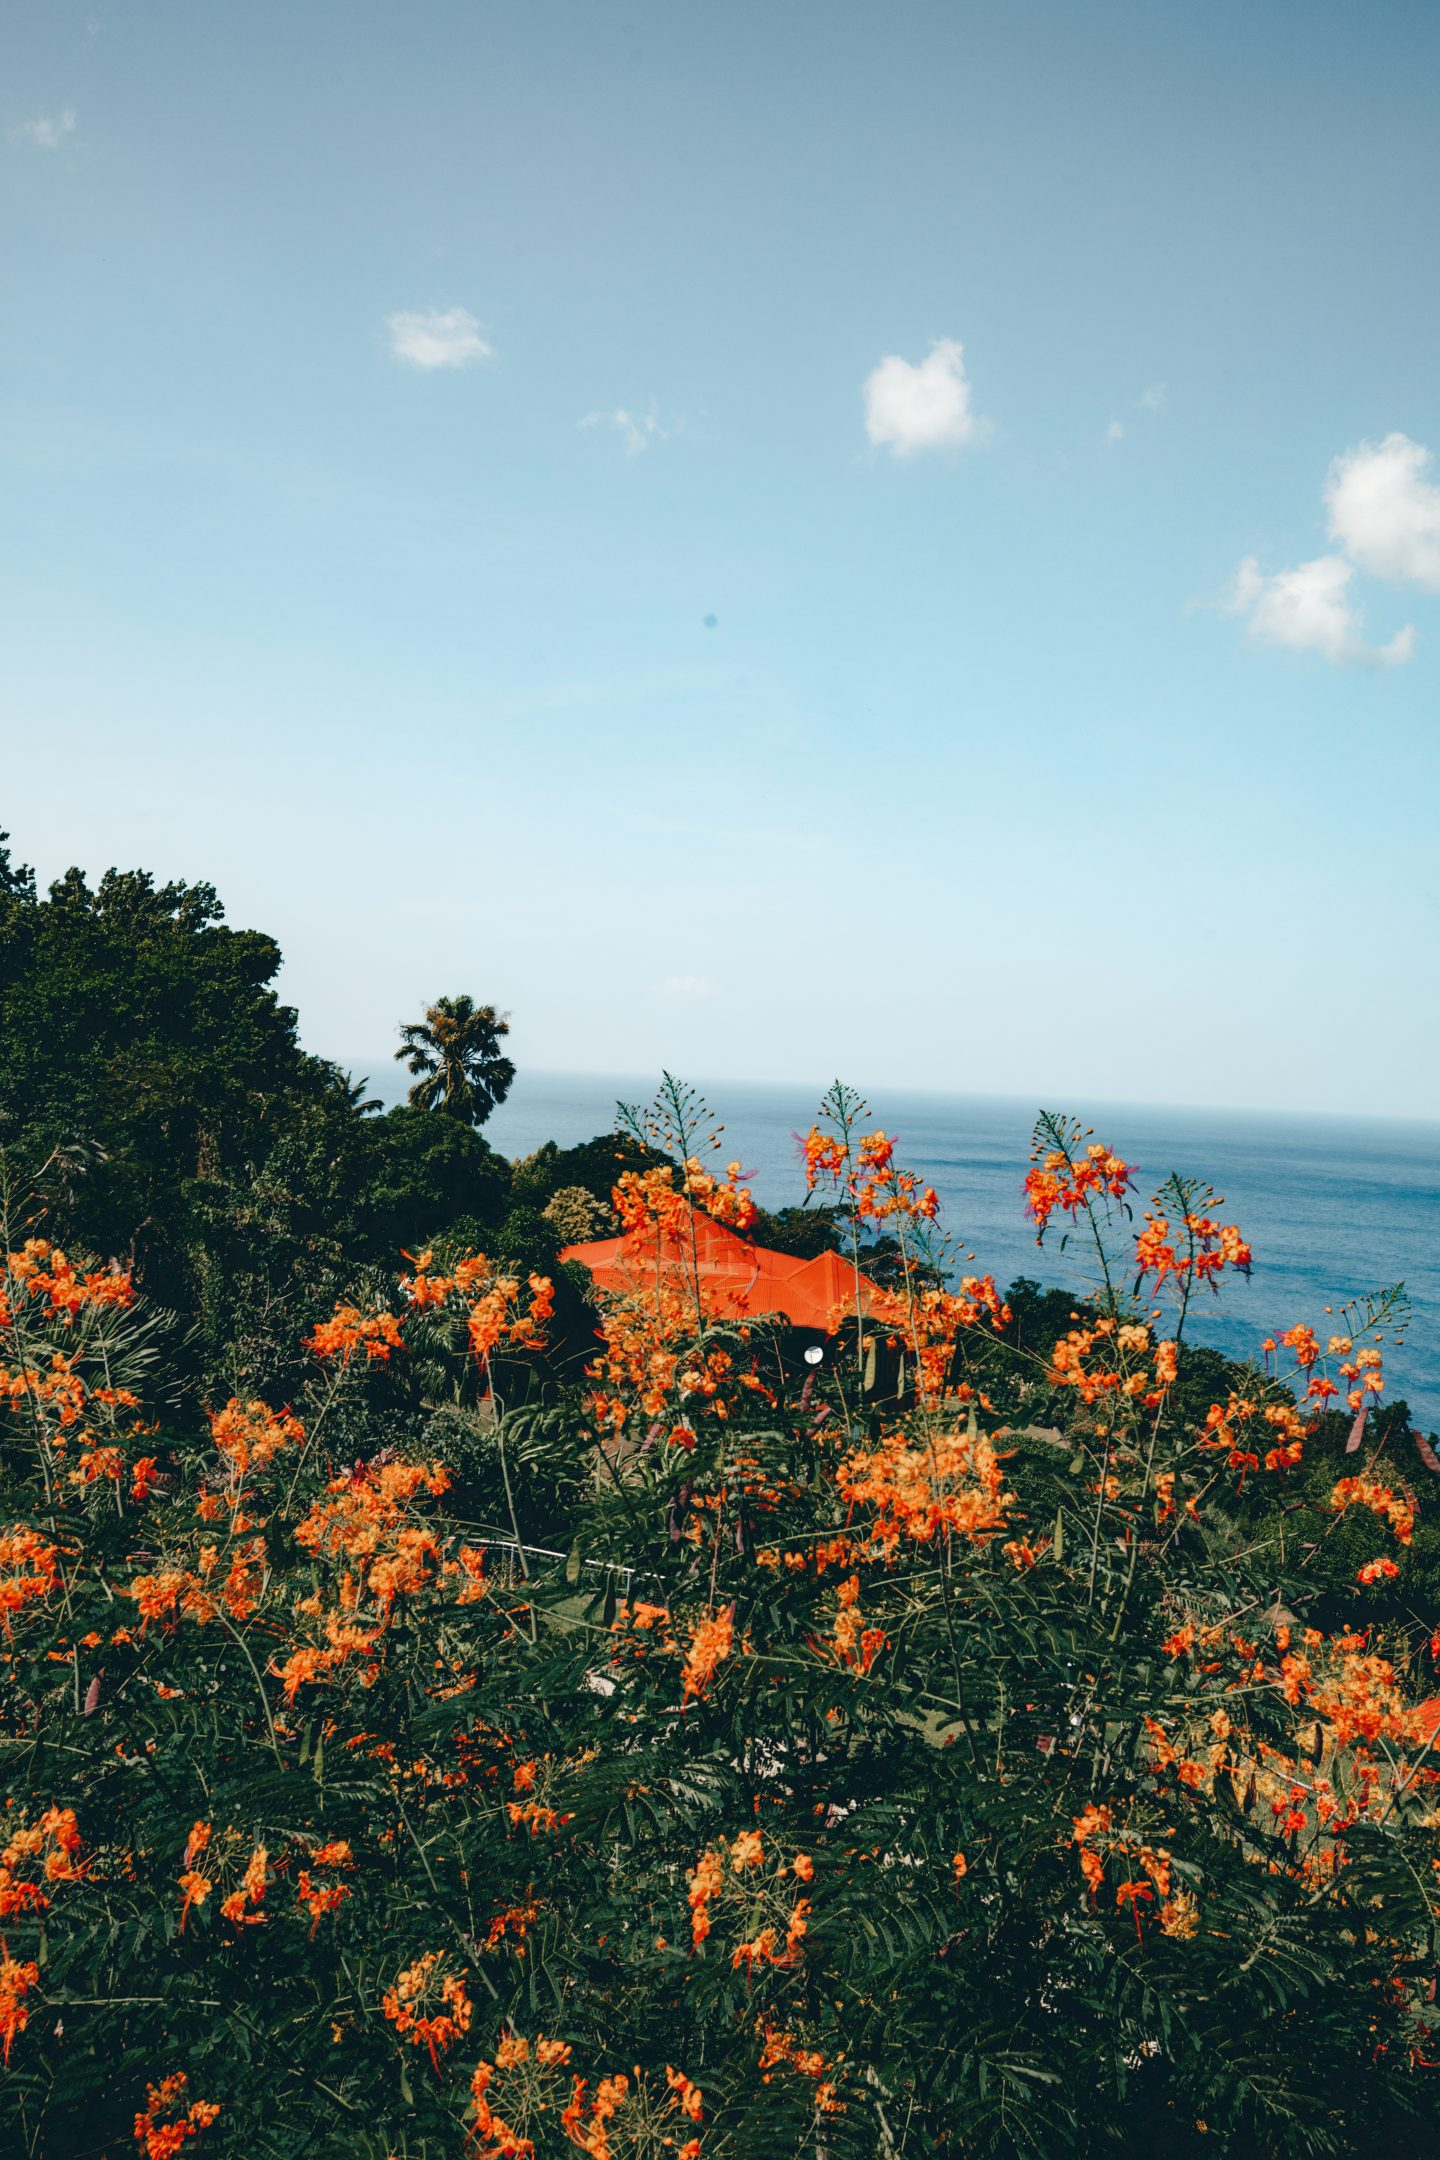 Jardin botanique Guadeloupe - Blondie Baby blog voyages